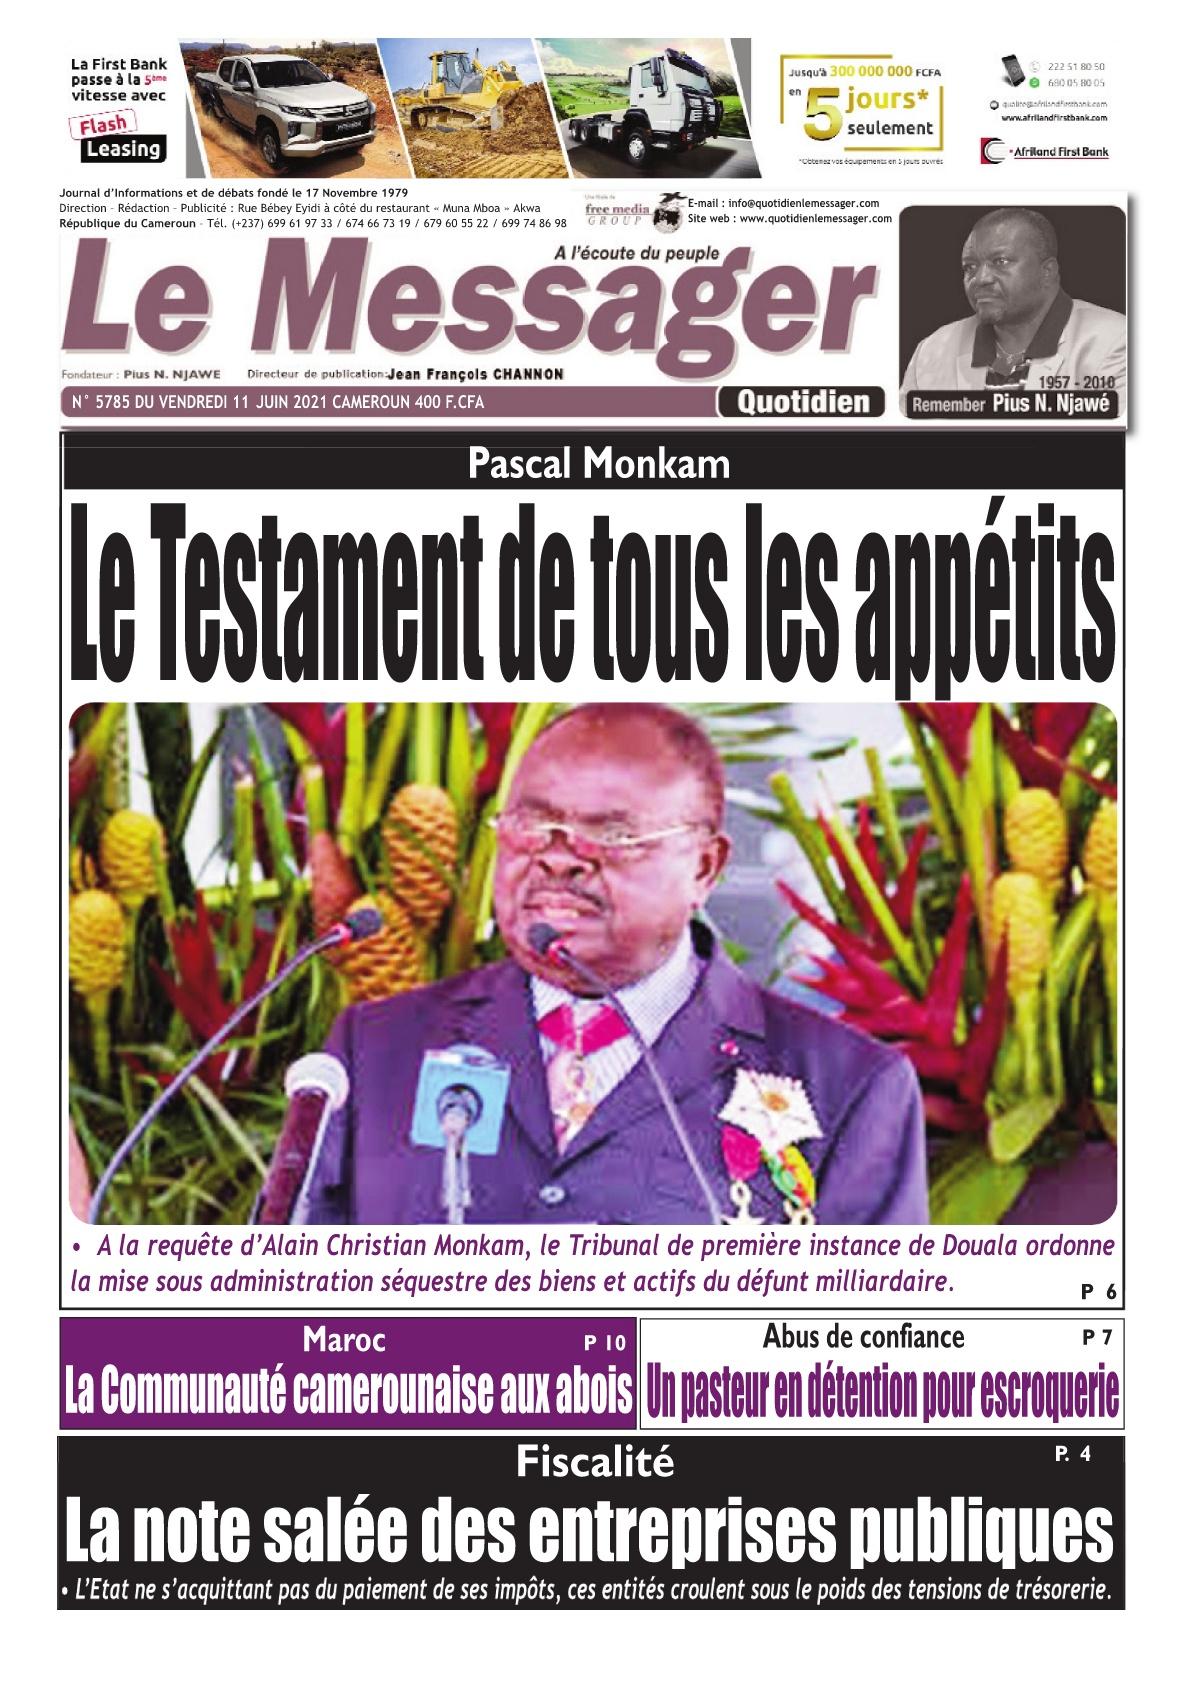 Le Messager - 11/06/2021